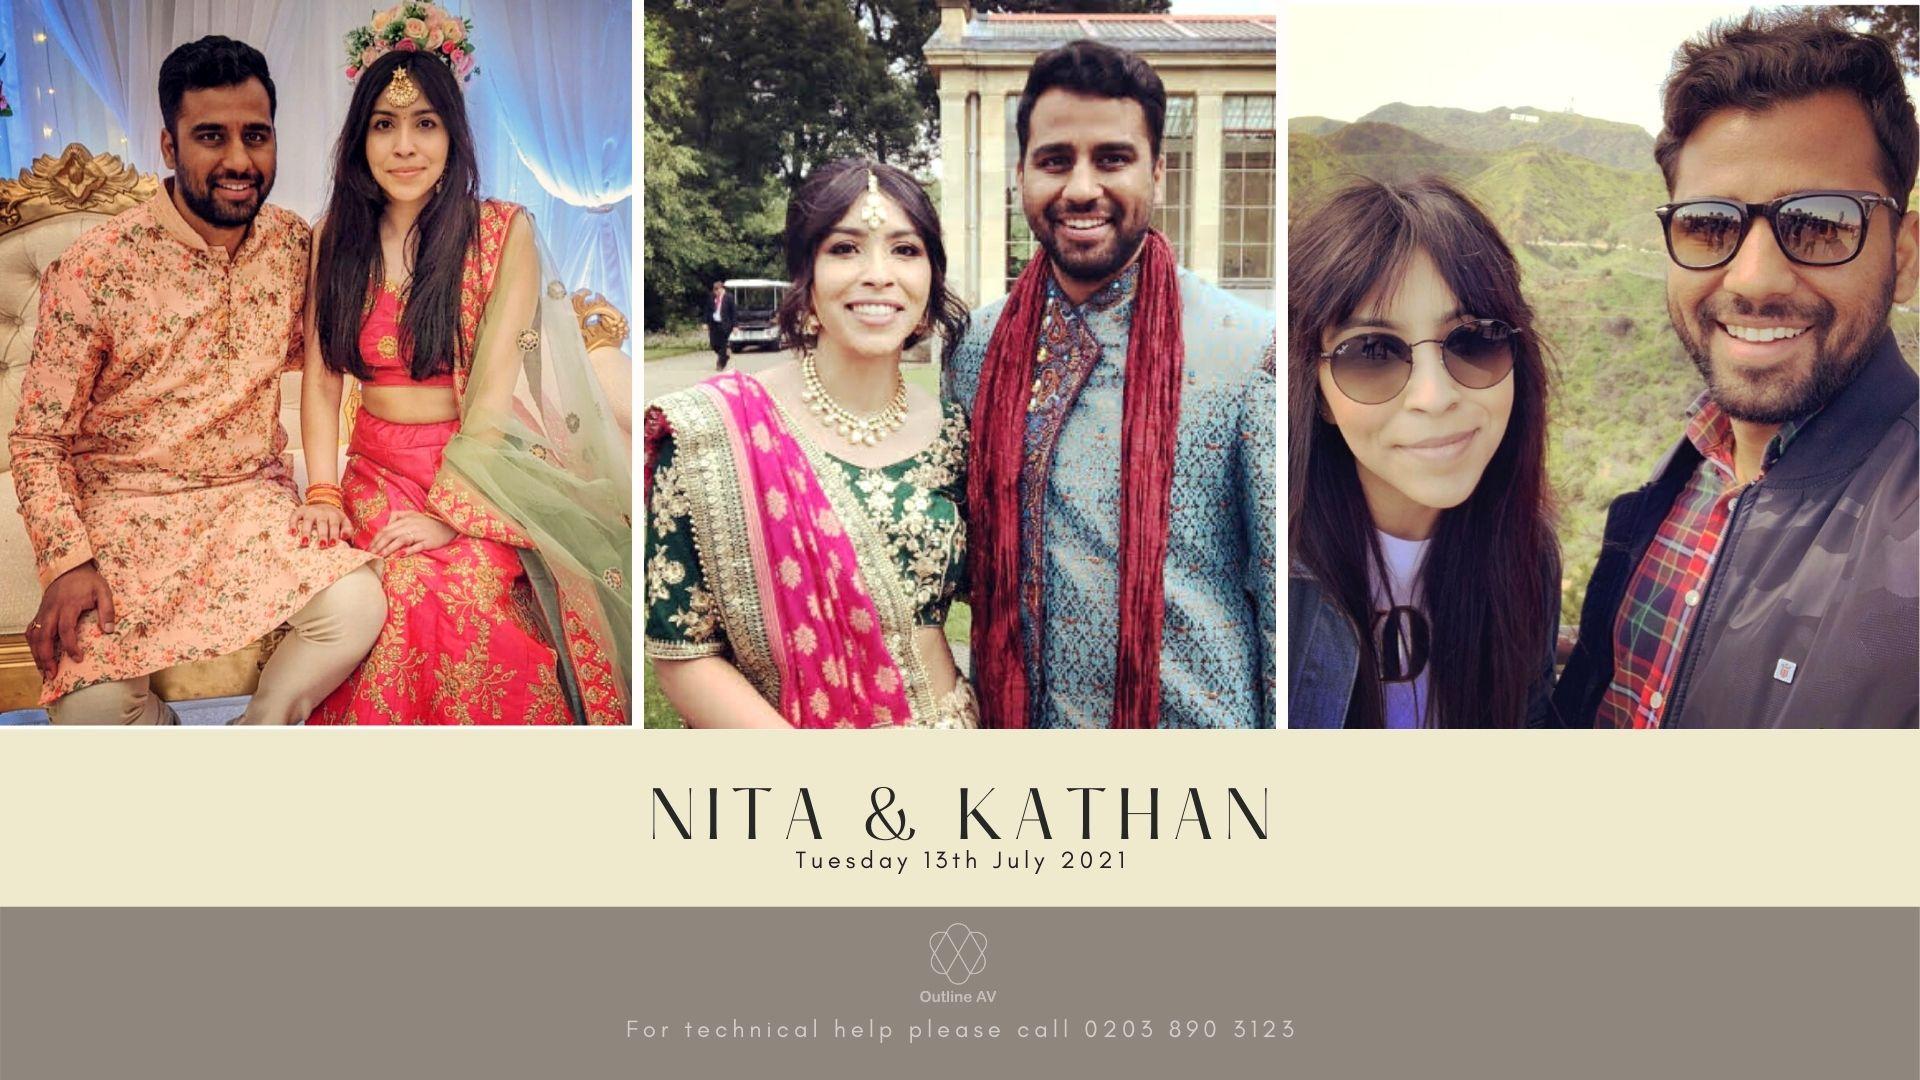 Nita & Kathan - Live Stream